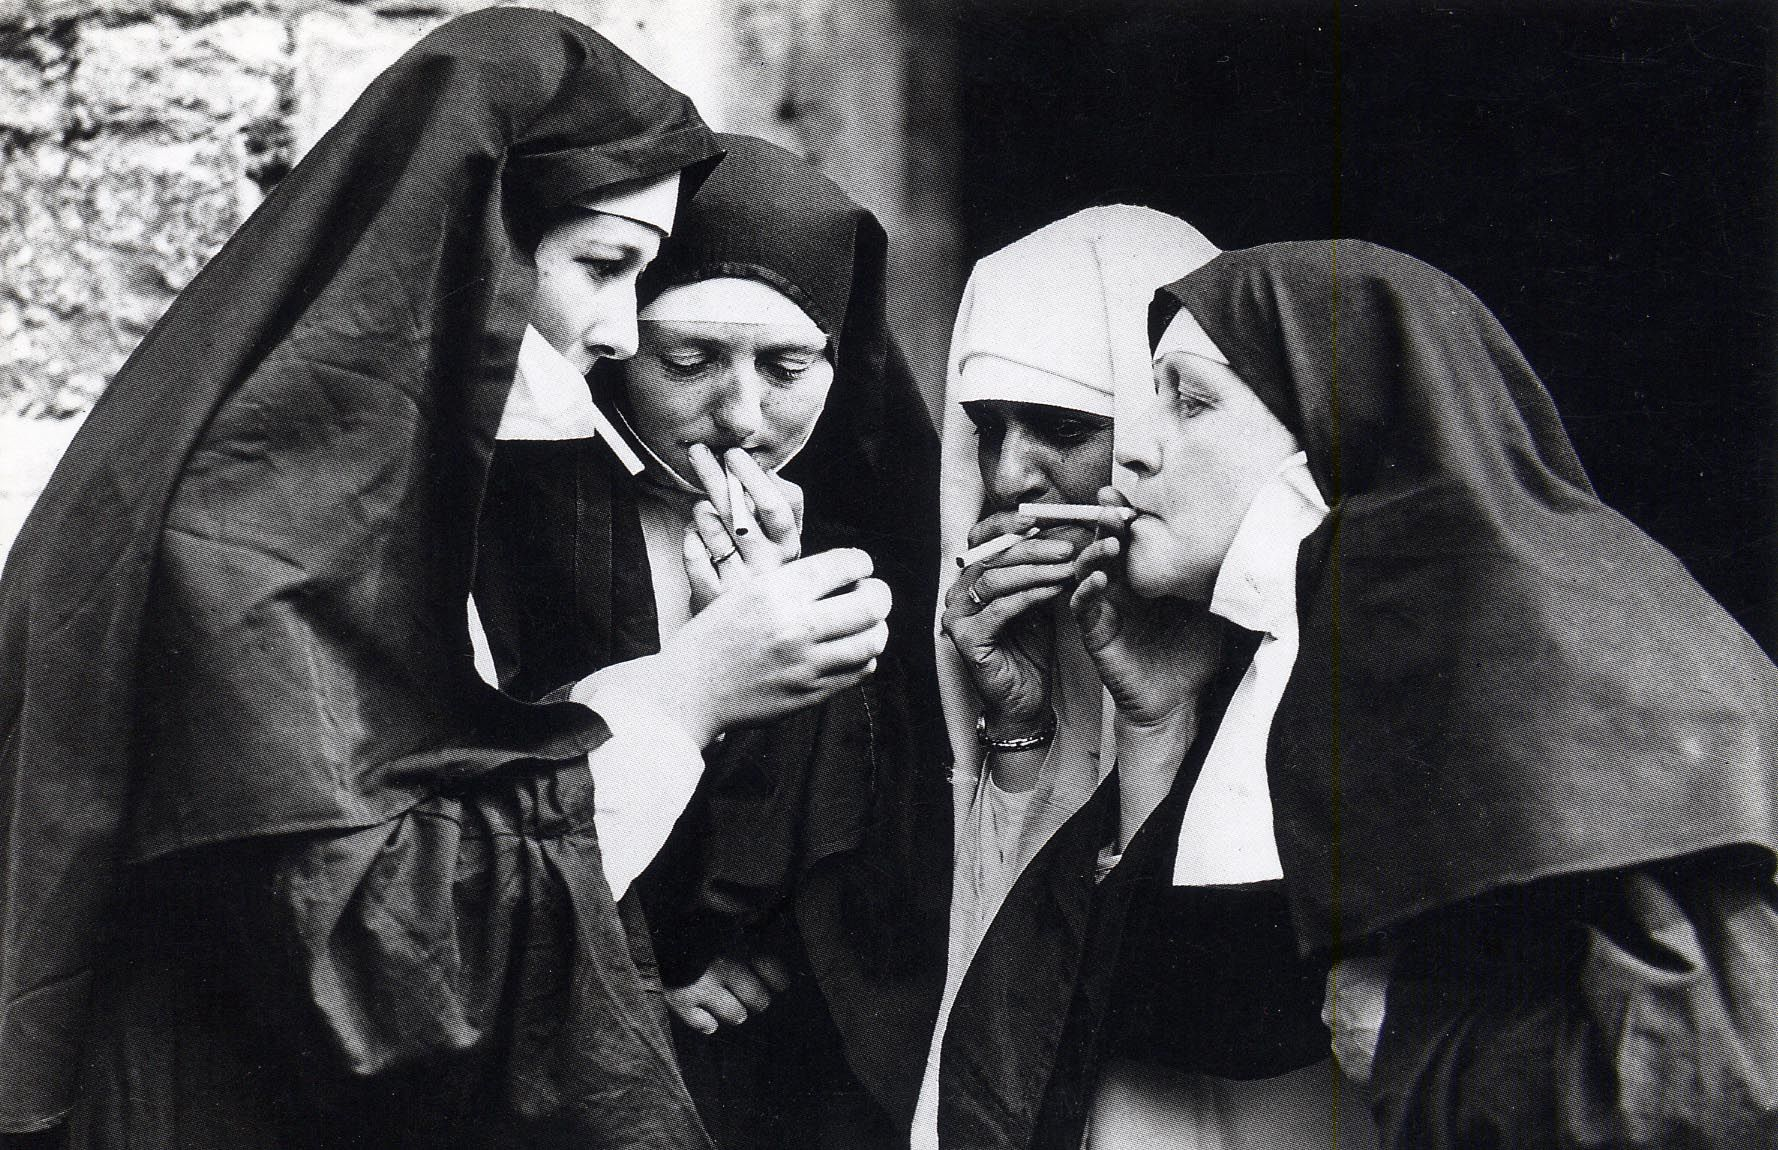 Фото монашек во грехе 3 фотография